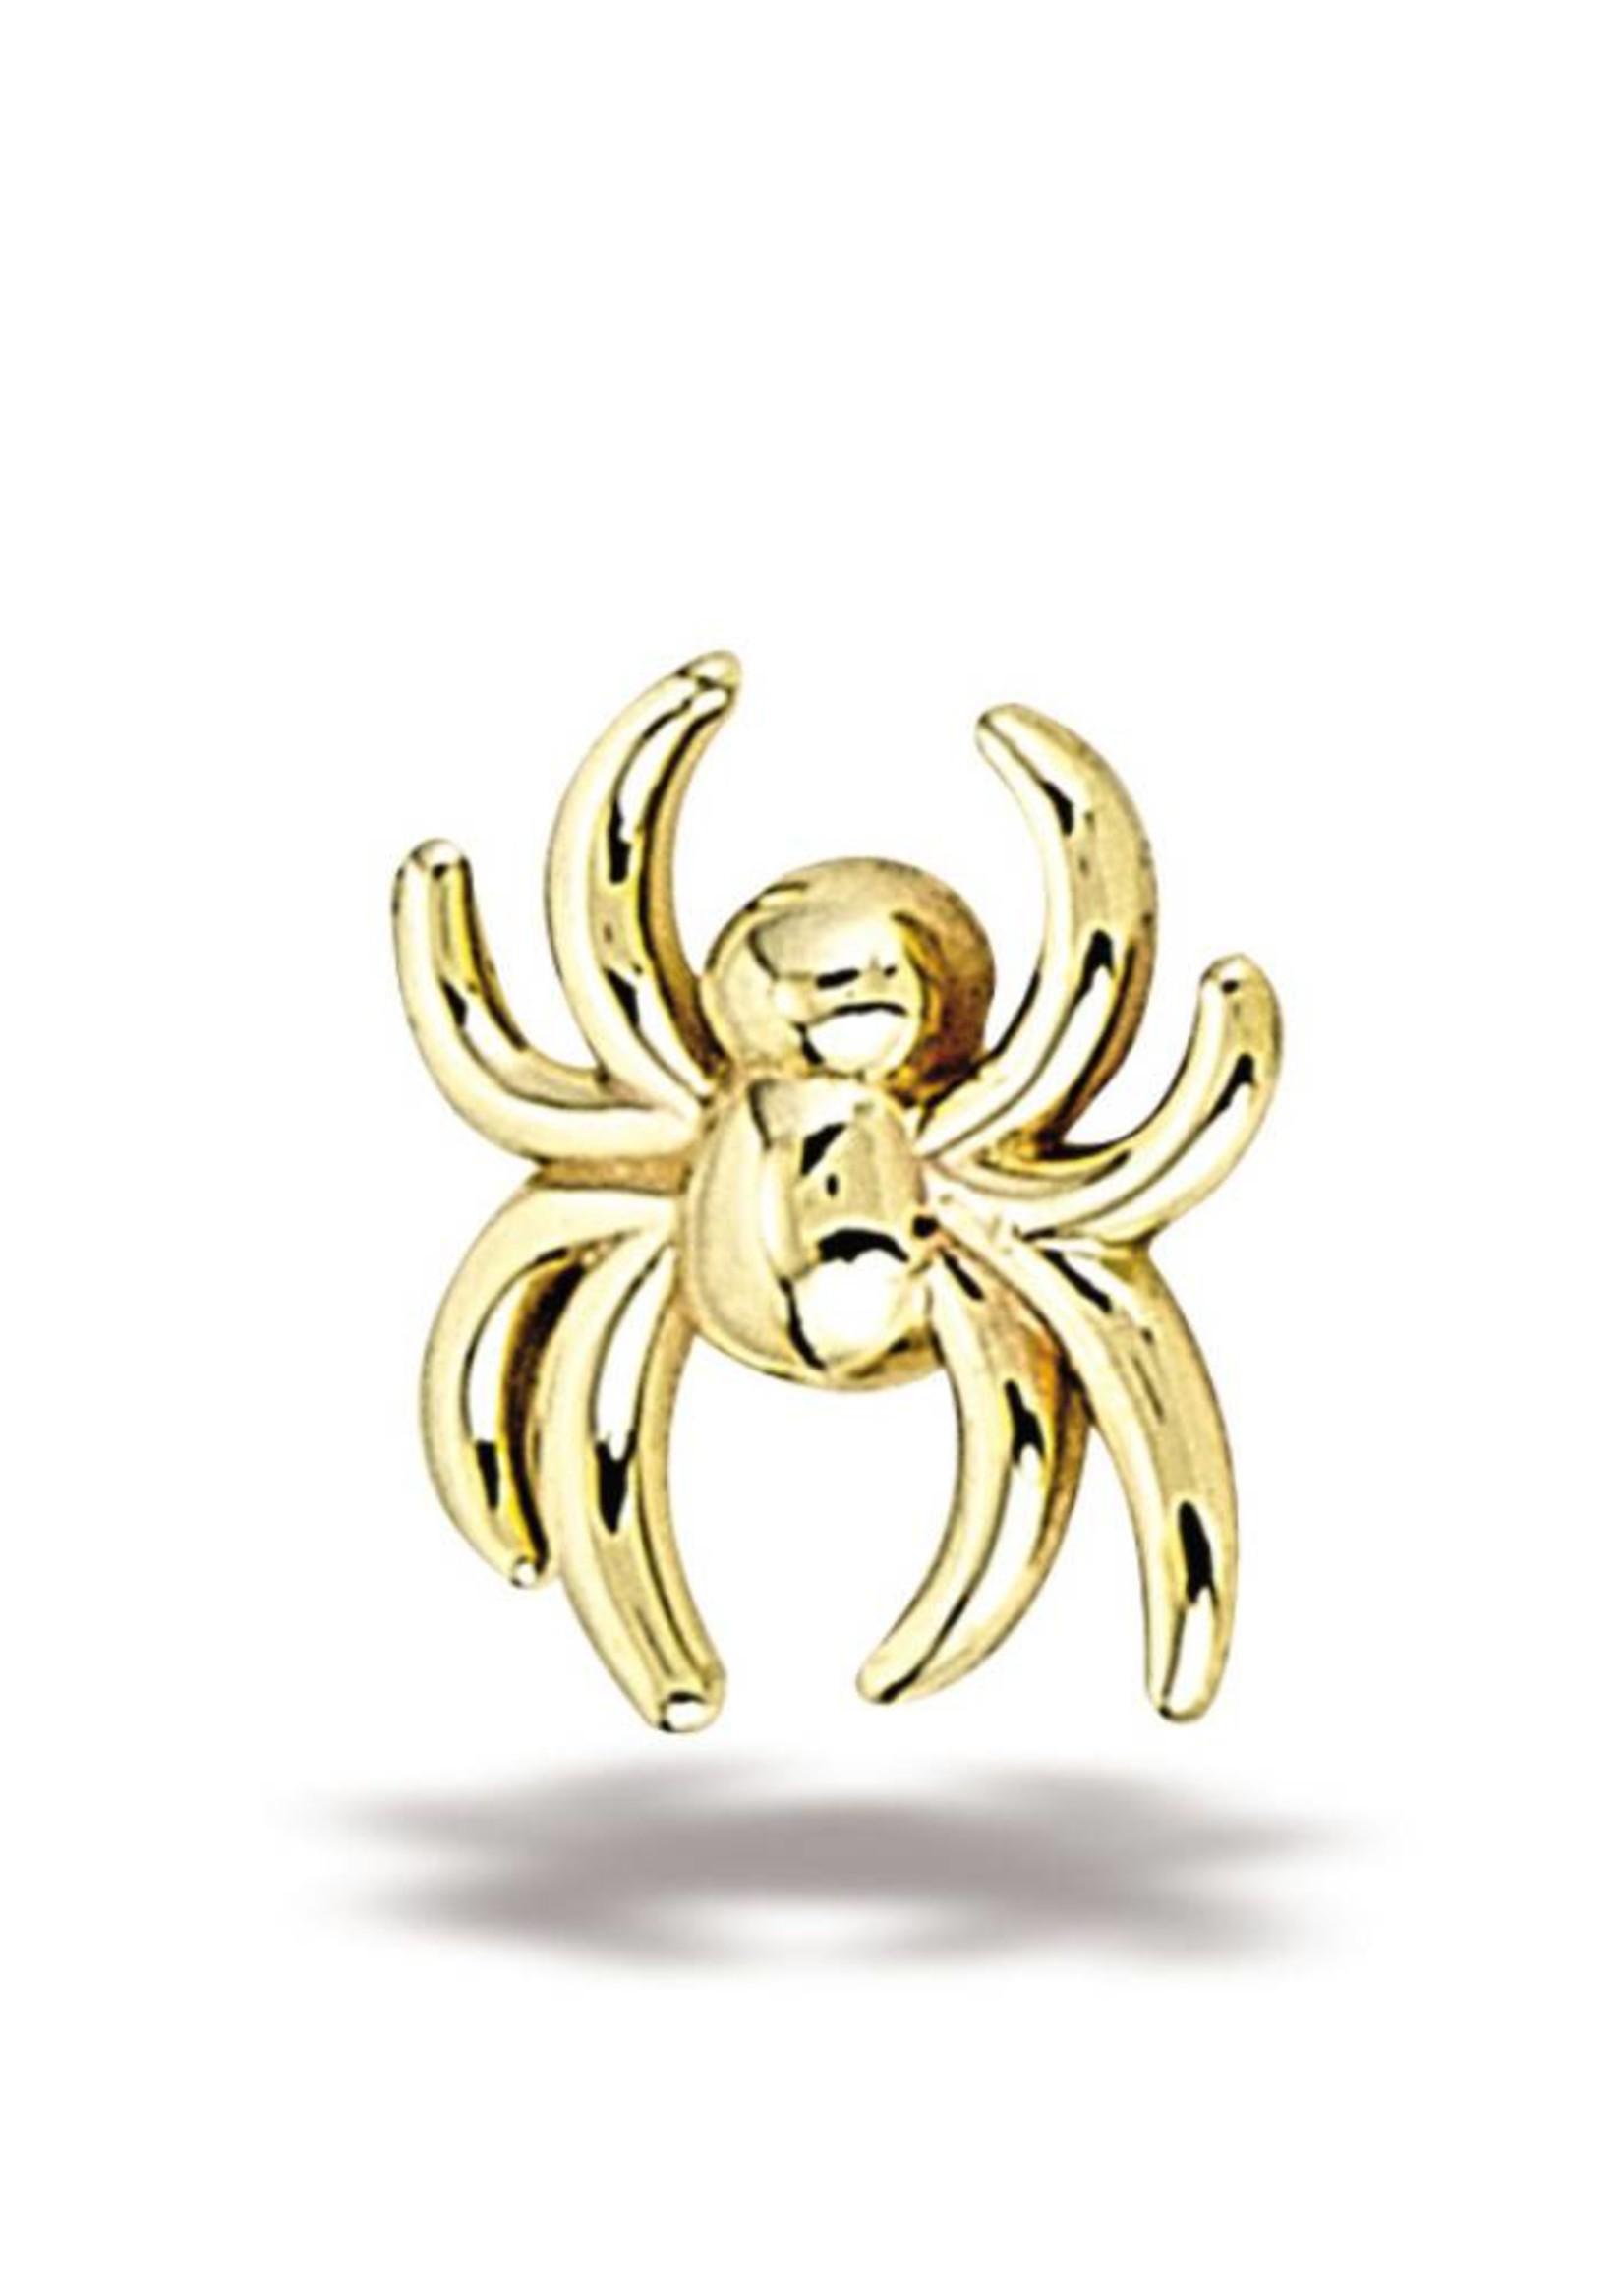 14k YG Spider (6x5.5mm) Threadless End